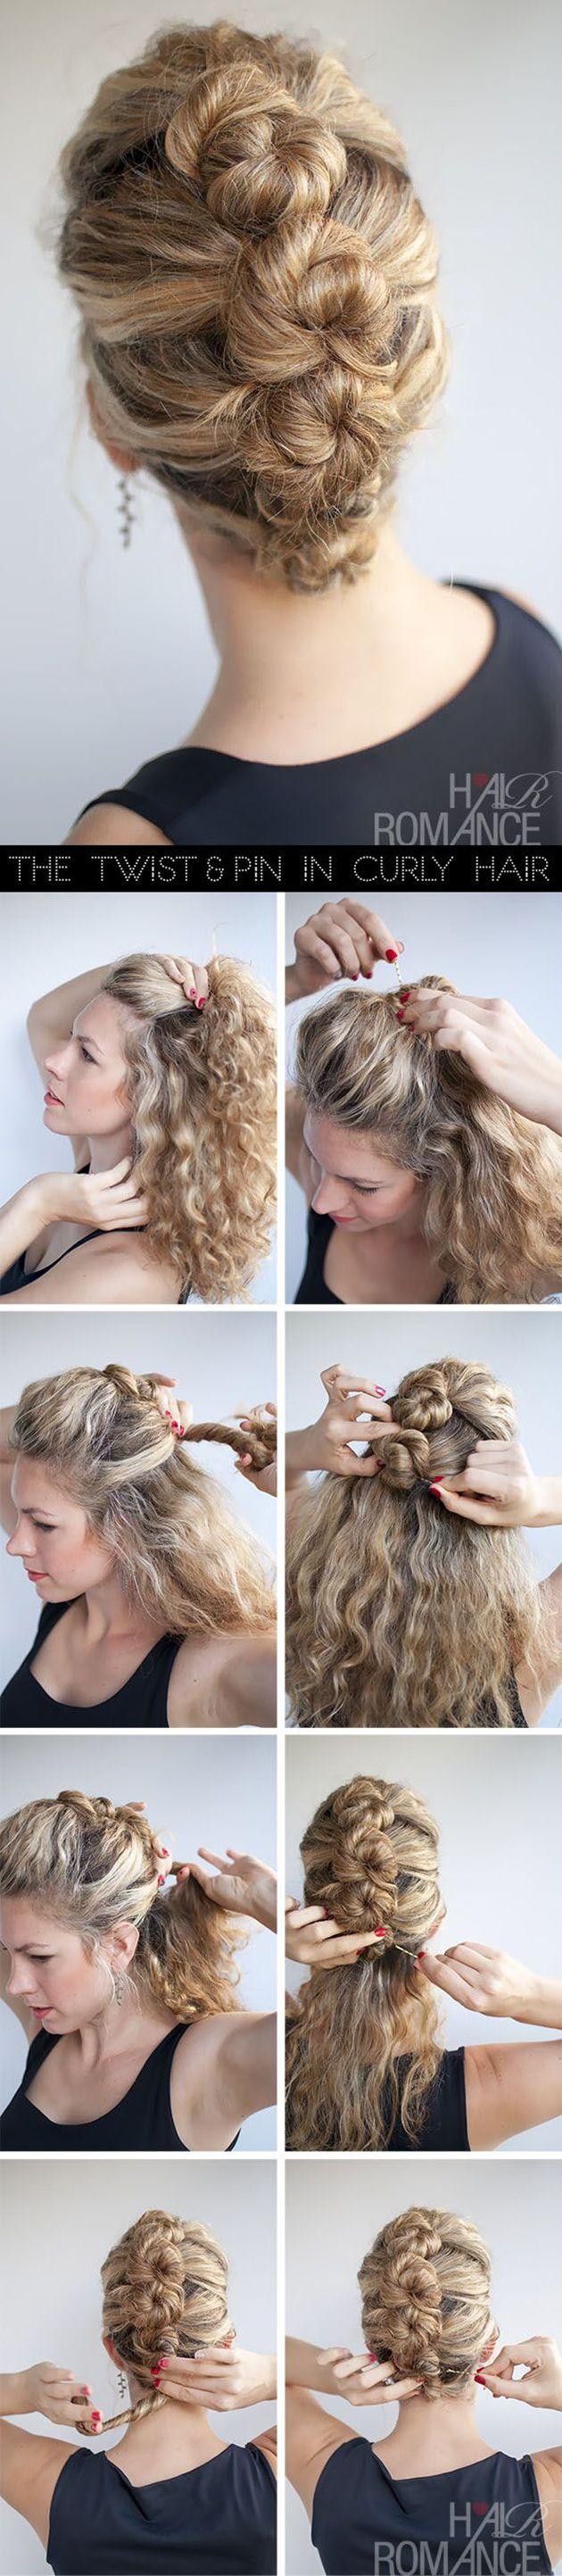 Tuto coiffure pinterest recogido boda pinterest hair style